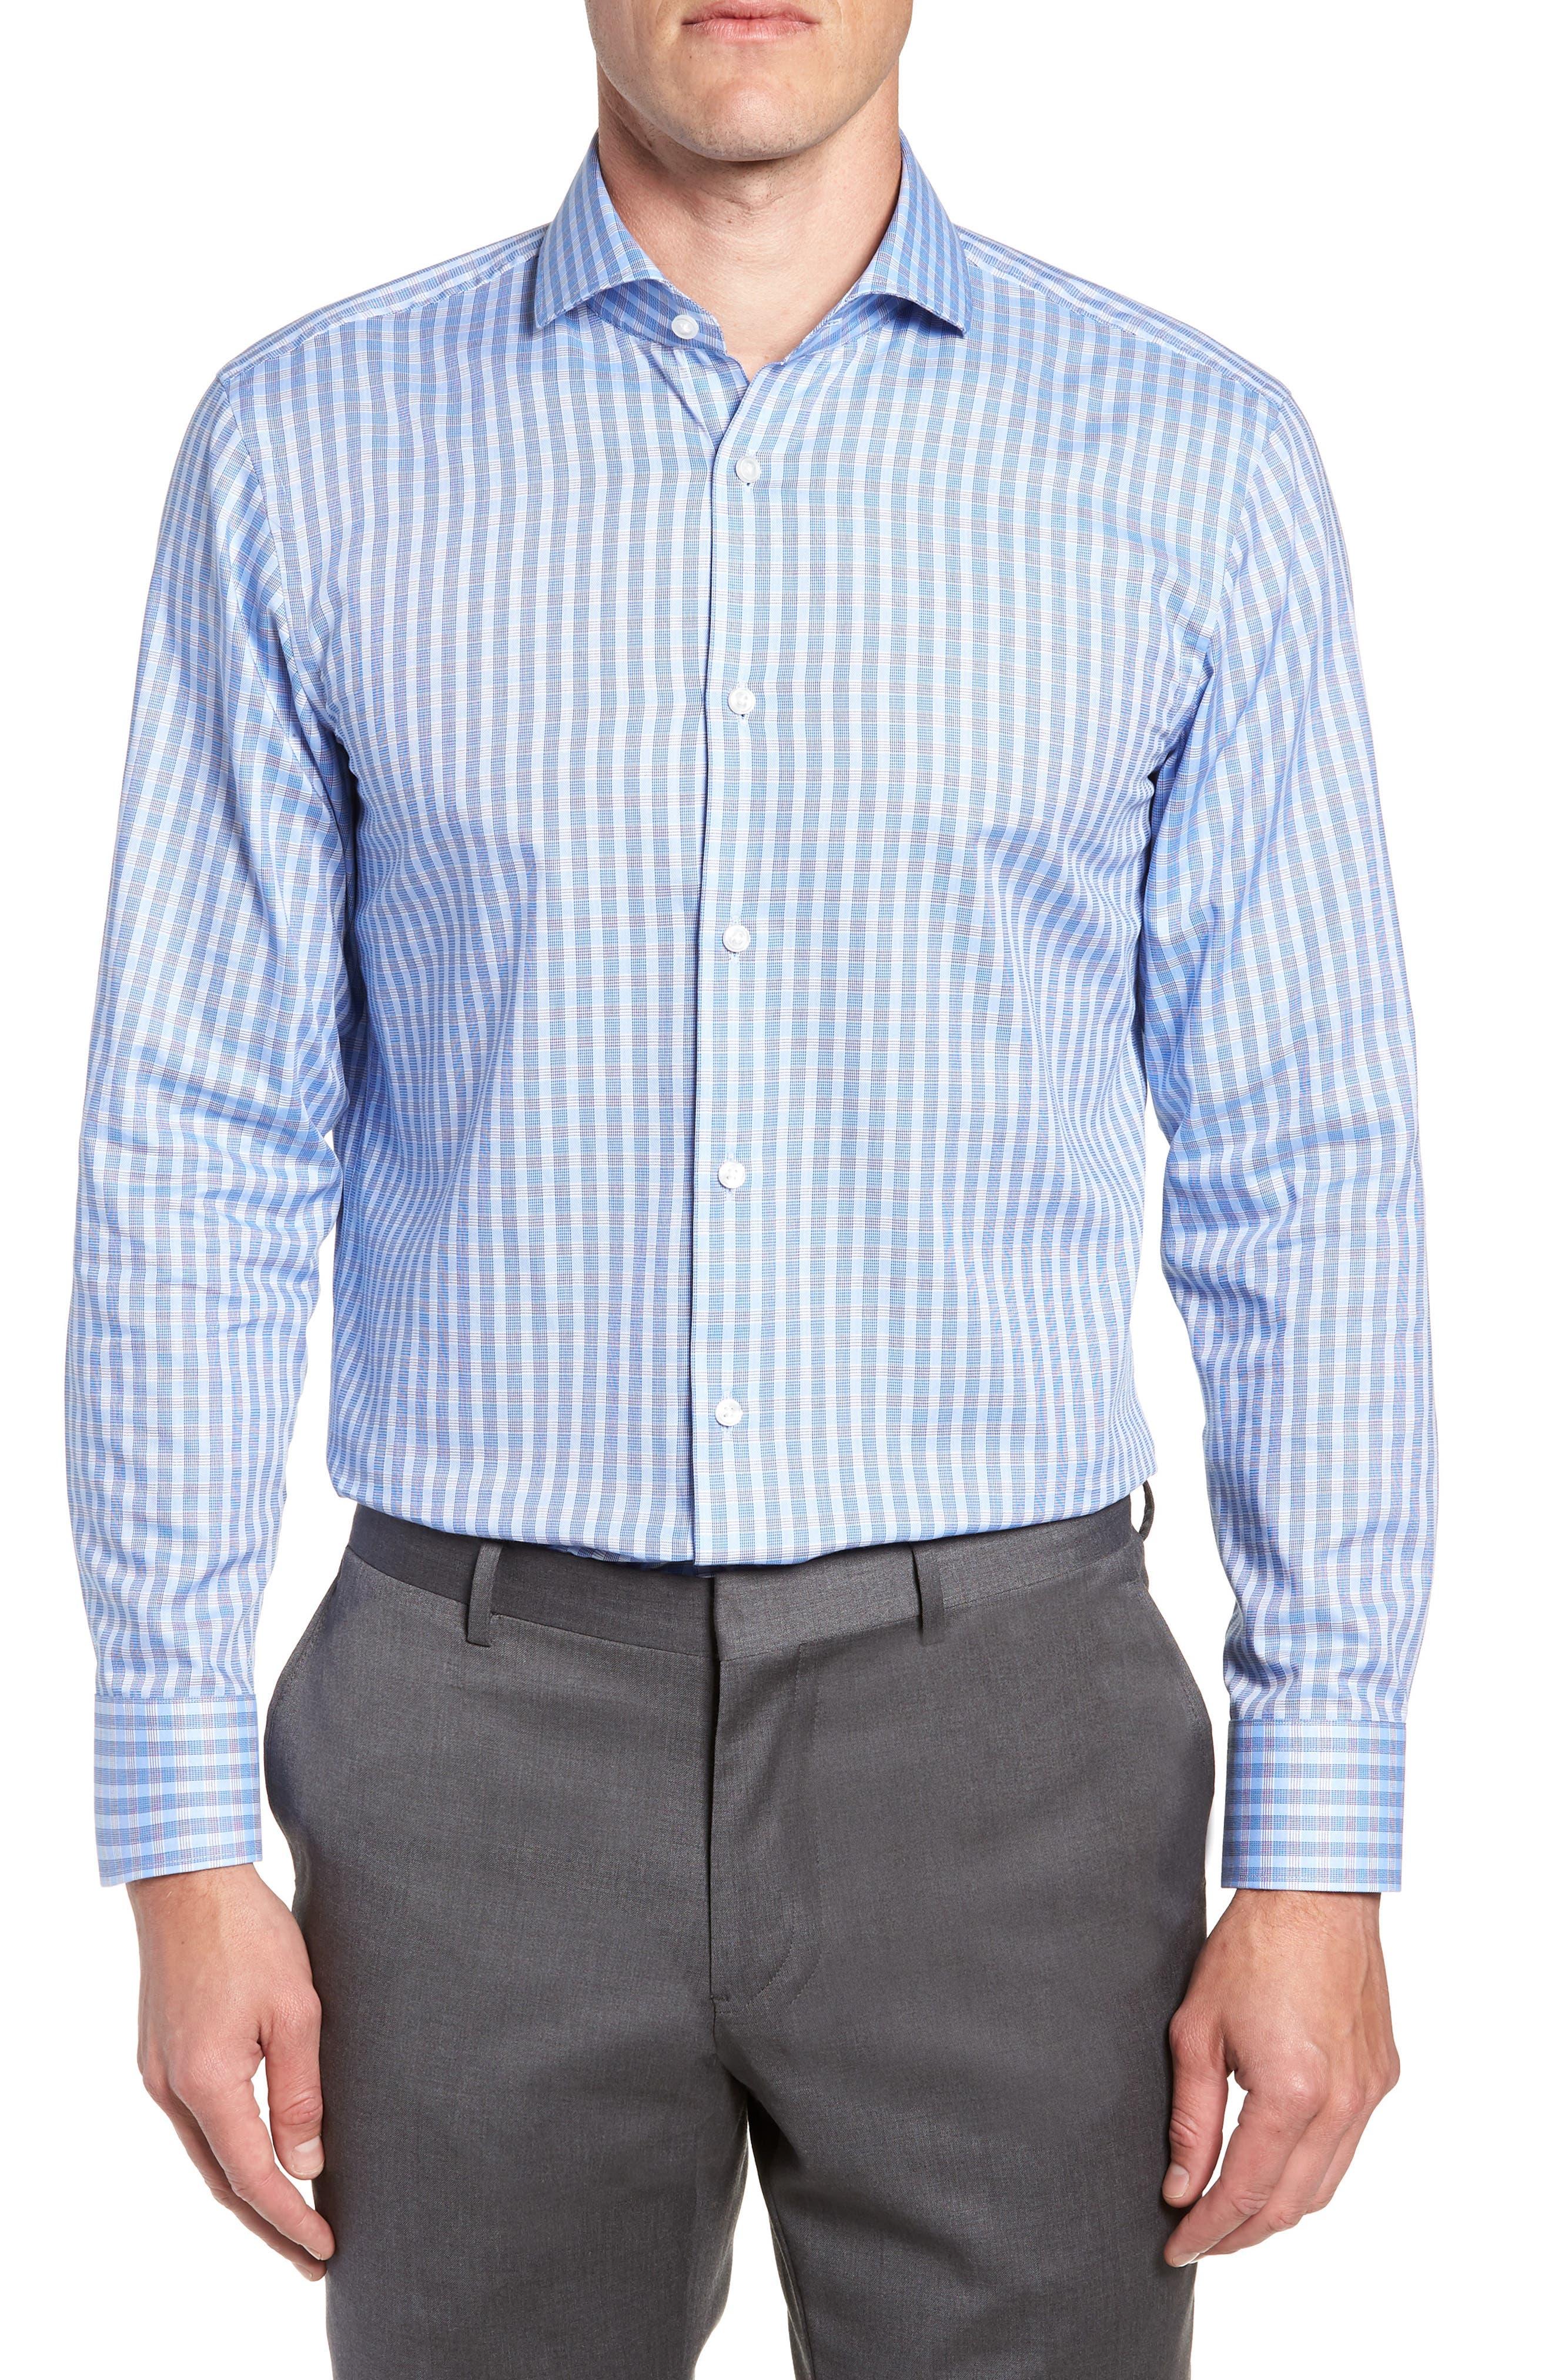 BOSS, Mark Sharp Fit Check Dress Shirt, Main thumbnail 1, color, BLUE